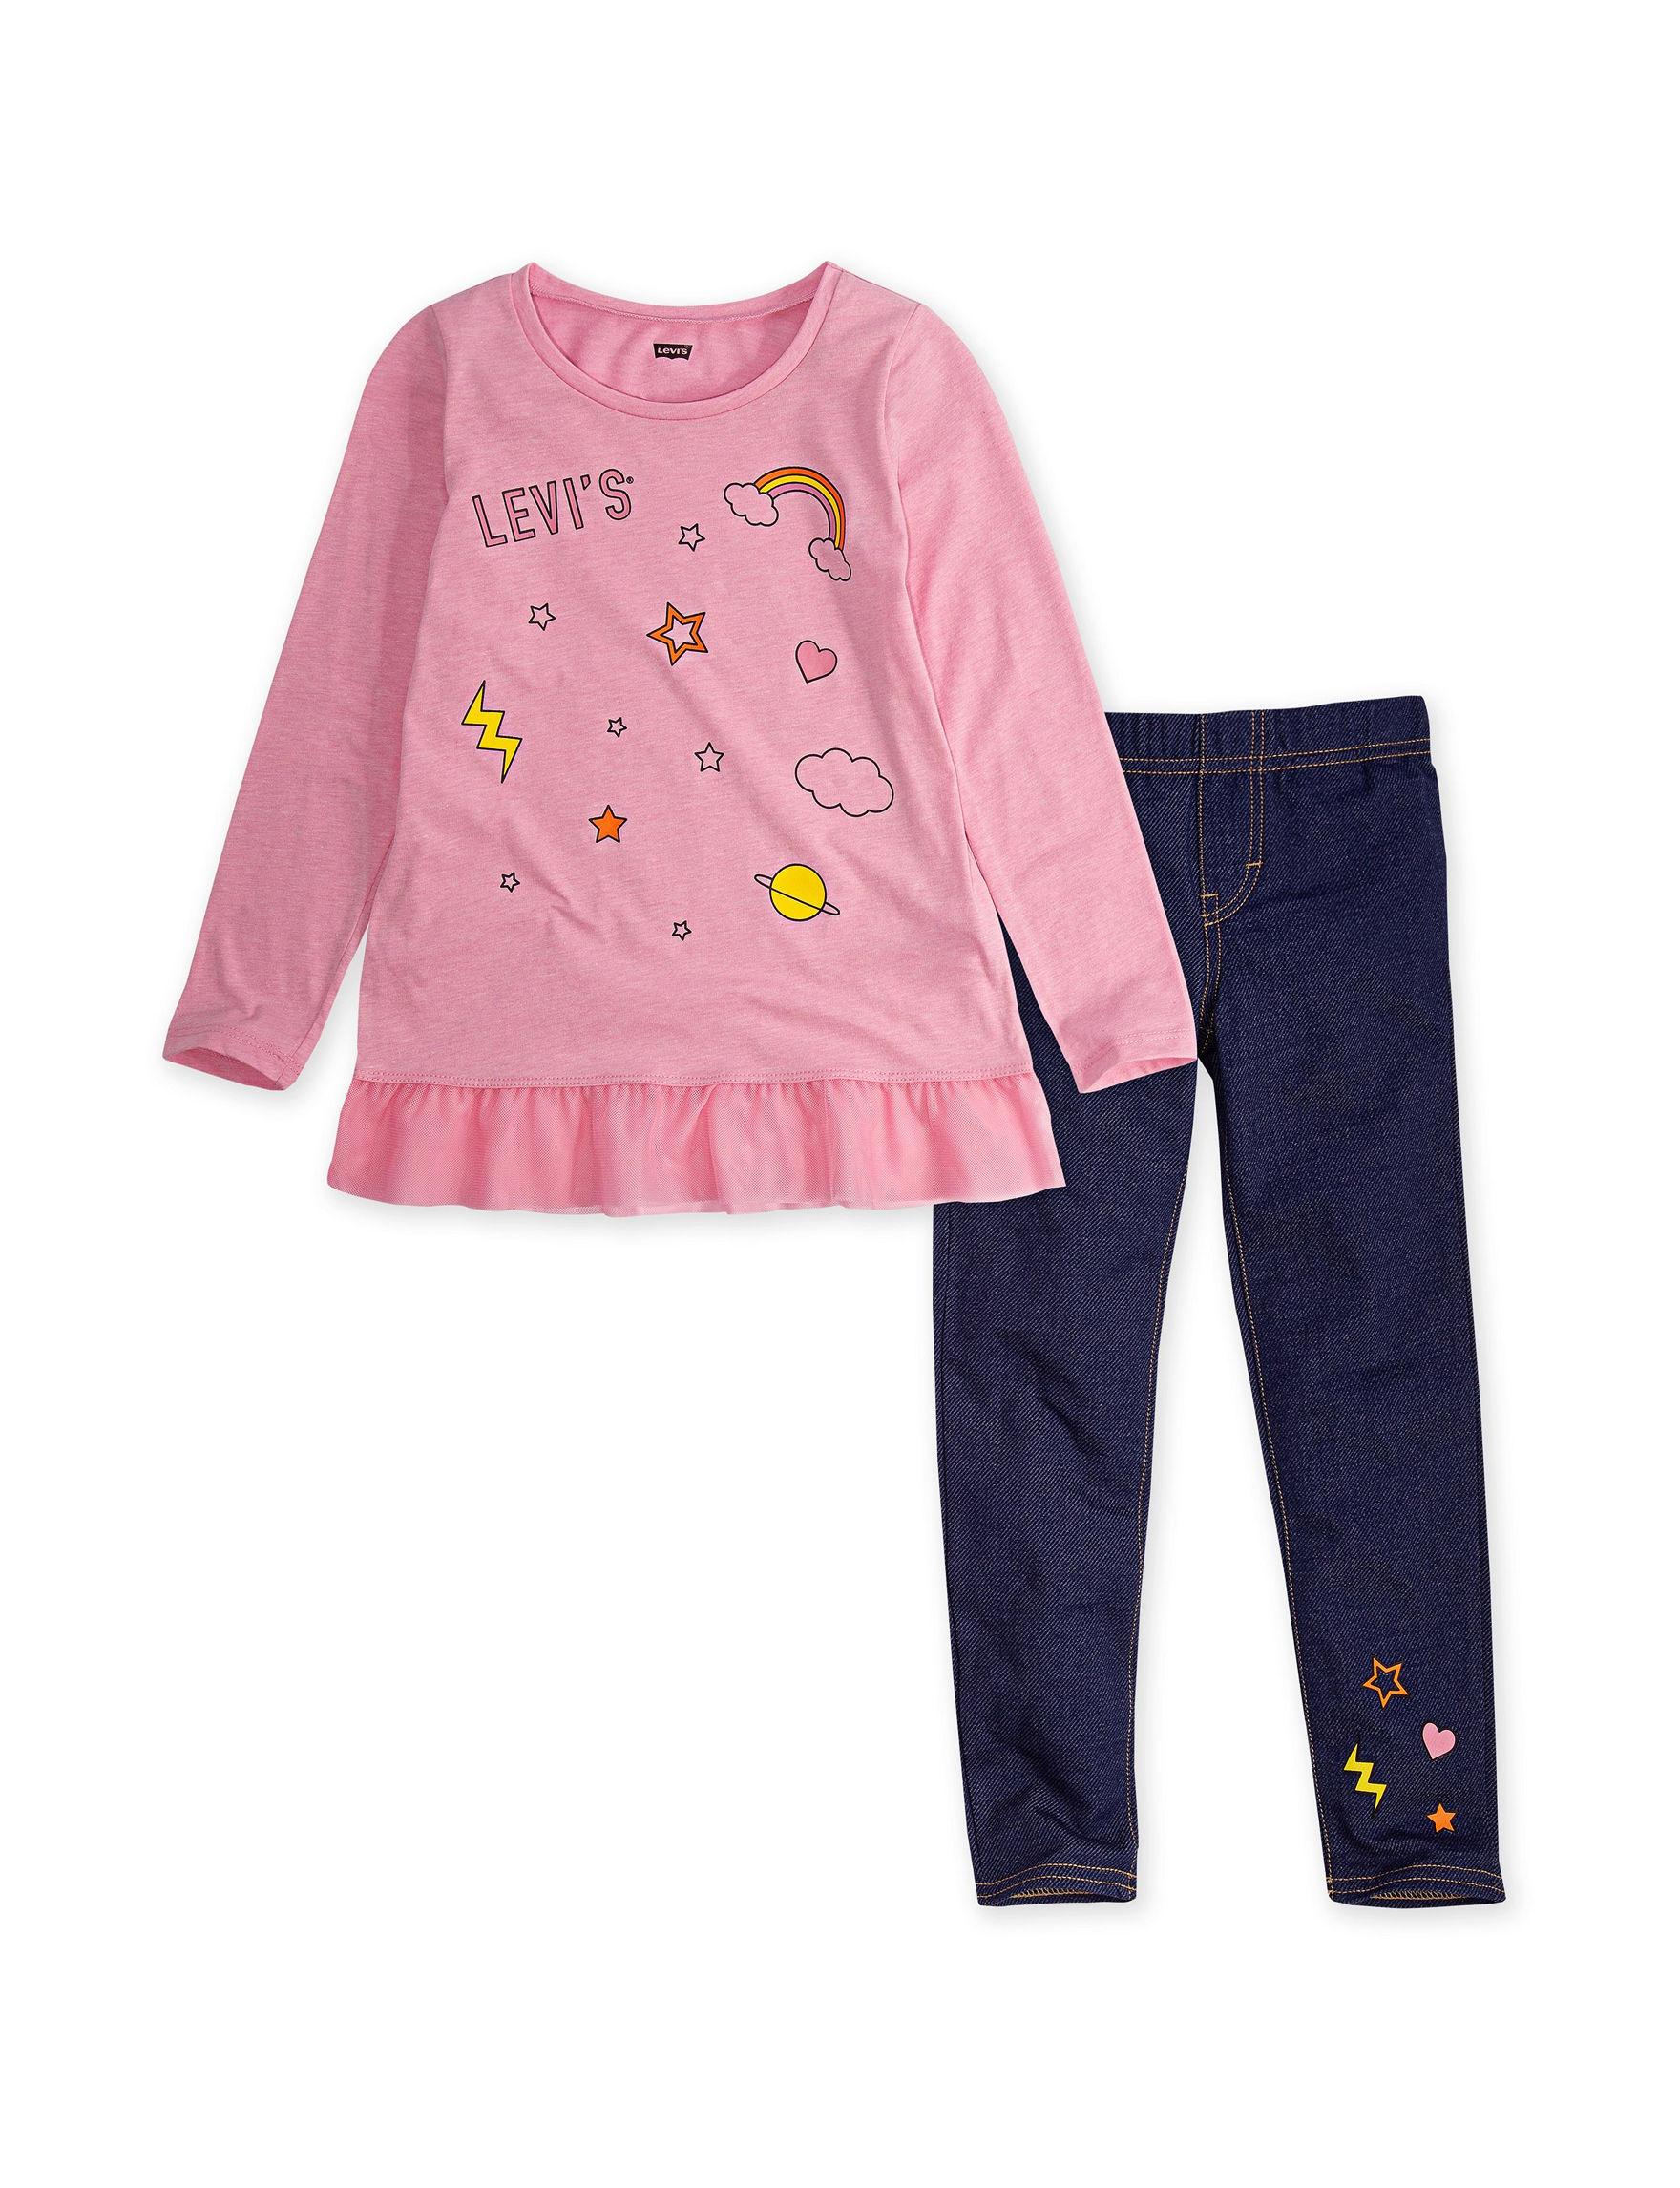 Levi's Pink / Denim